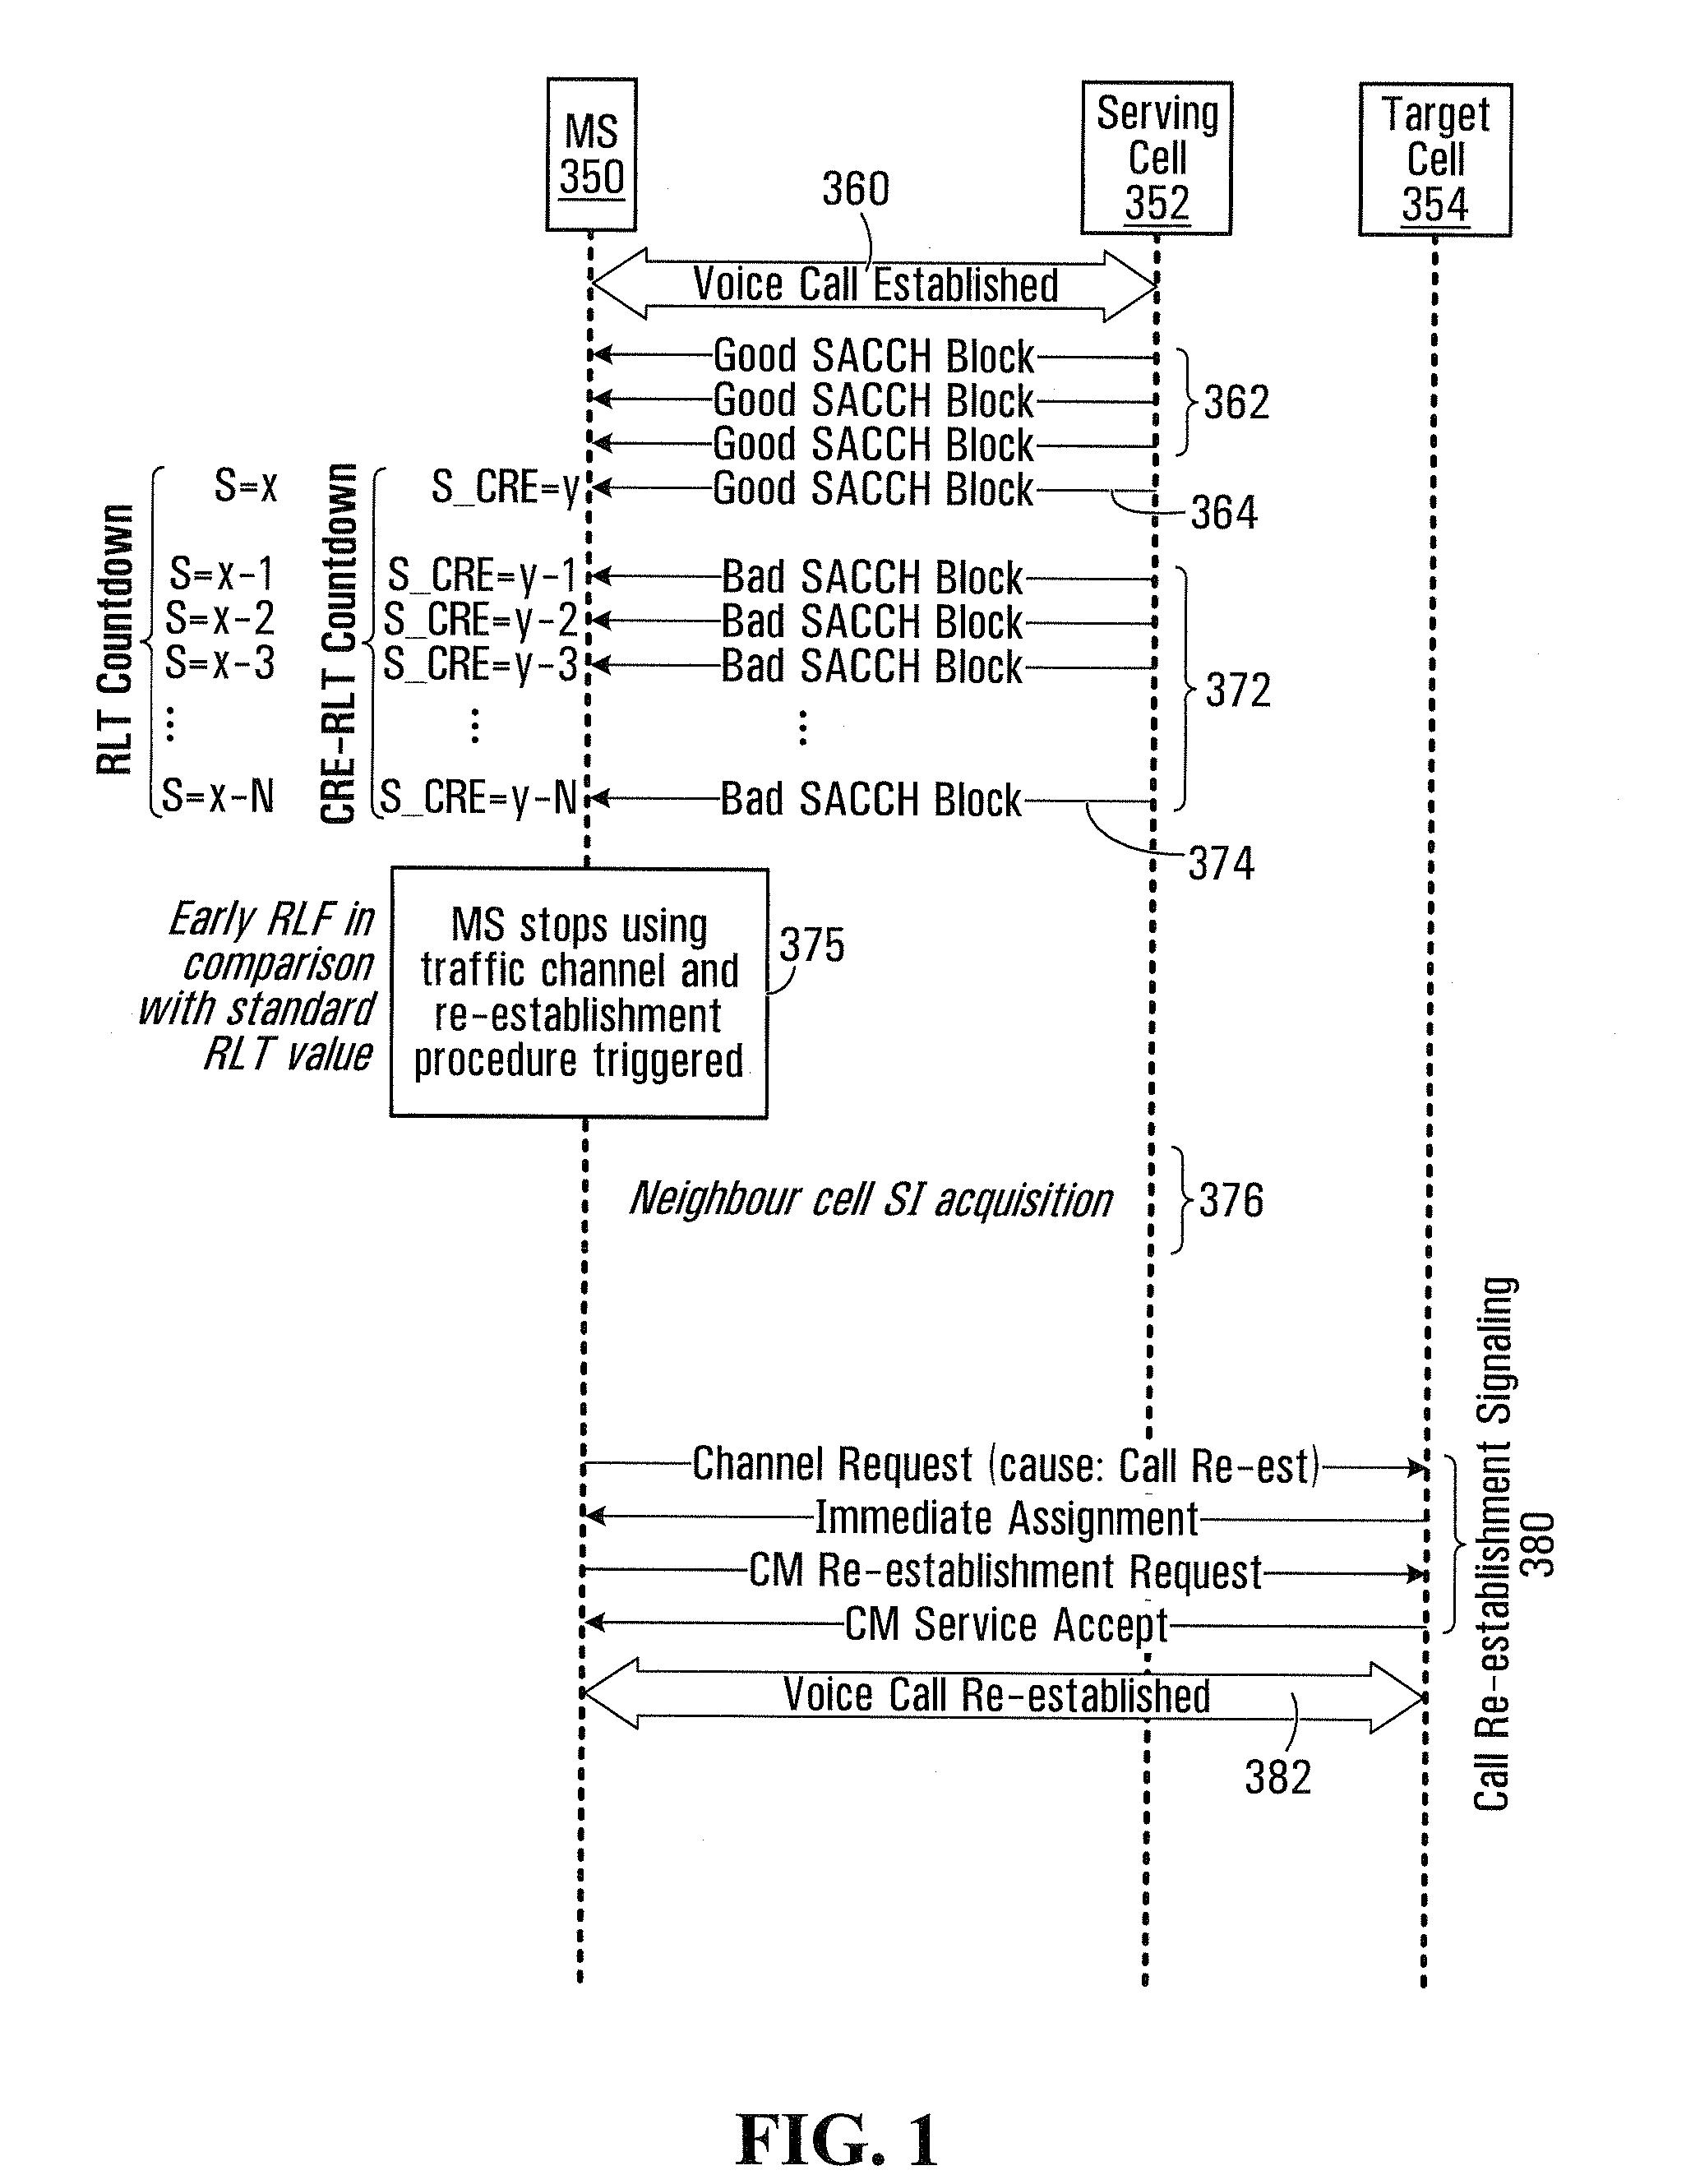 US20110053586A1 20110303 D00001?resize\=840%2C1088 valcom v 1030c wiring diagram on valcom images free download valcom v 1030c wiring diagram at honlapkeszites.co